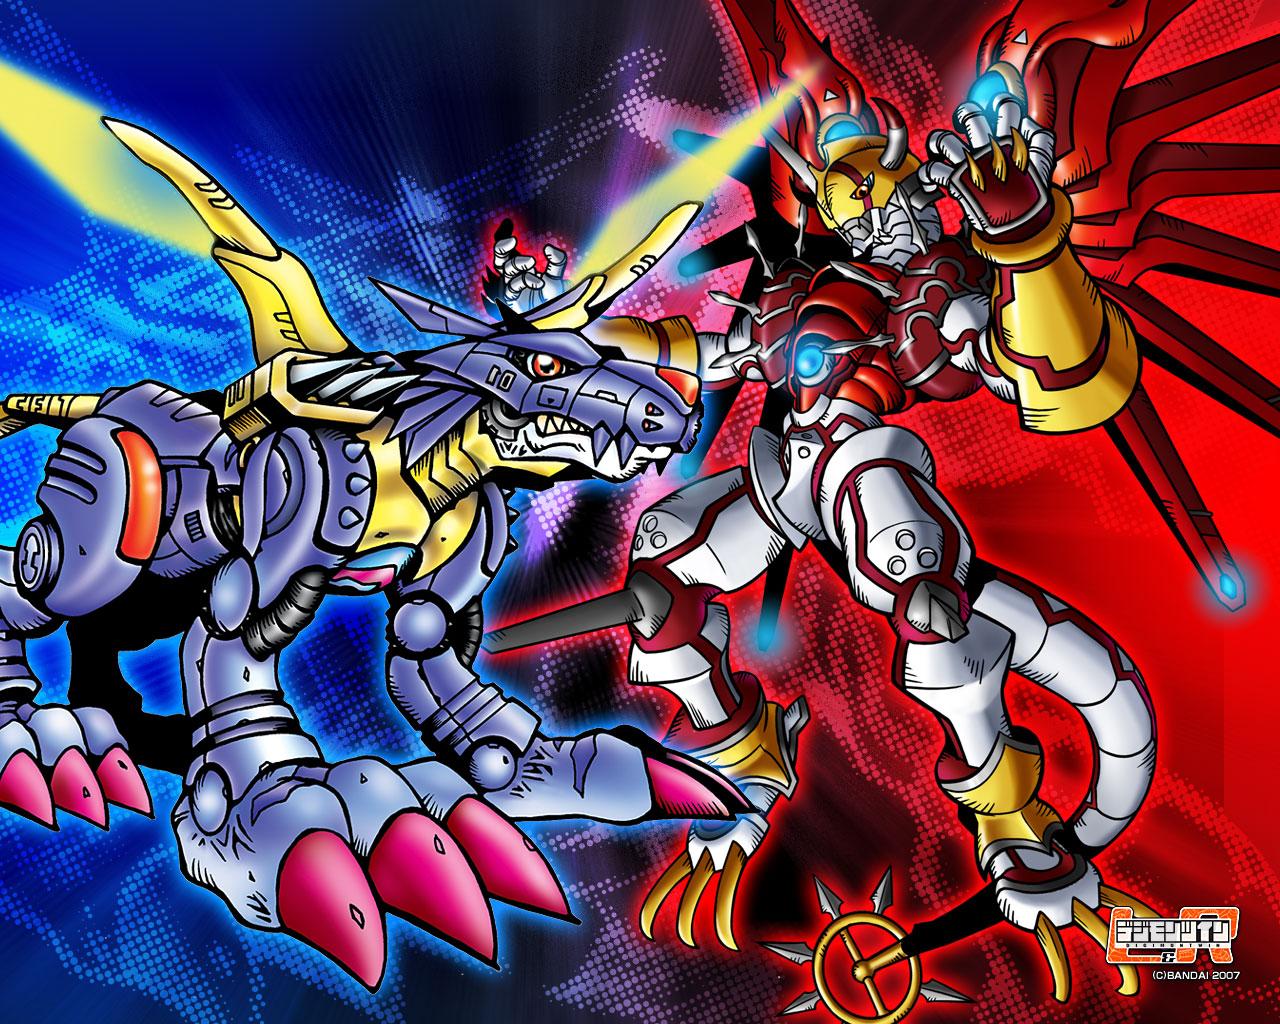 Fantico Digimon Tudo Sobre Digimon Est Aqui HD Wallpapers Download Free Images Wallpaper [1000image.com]